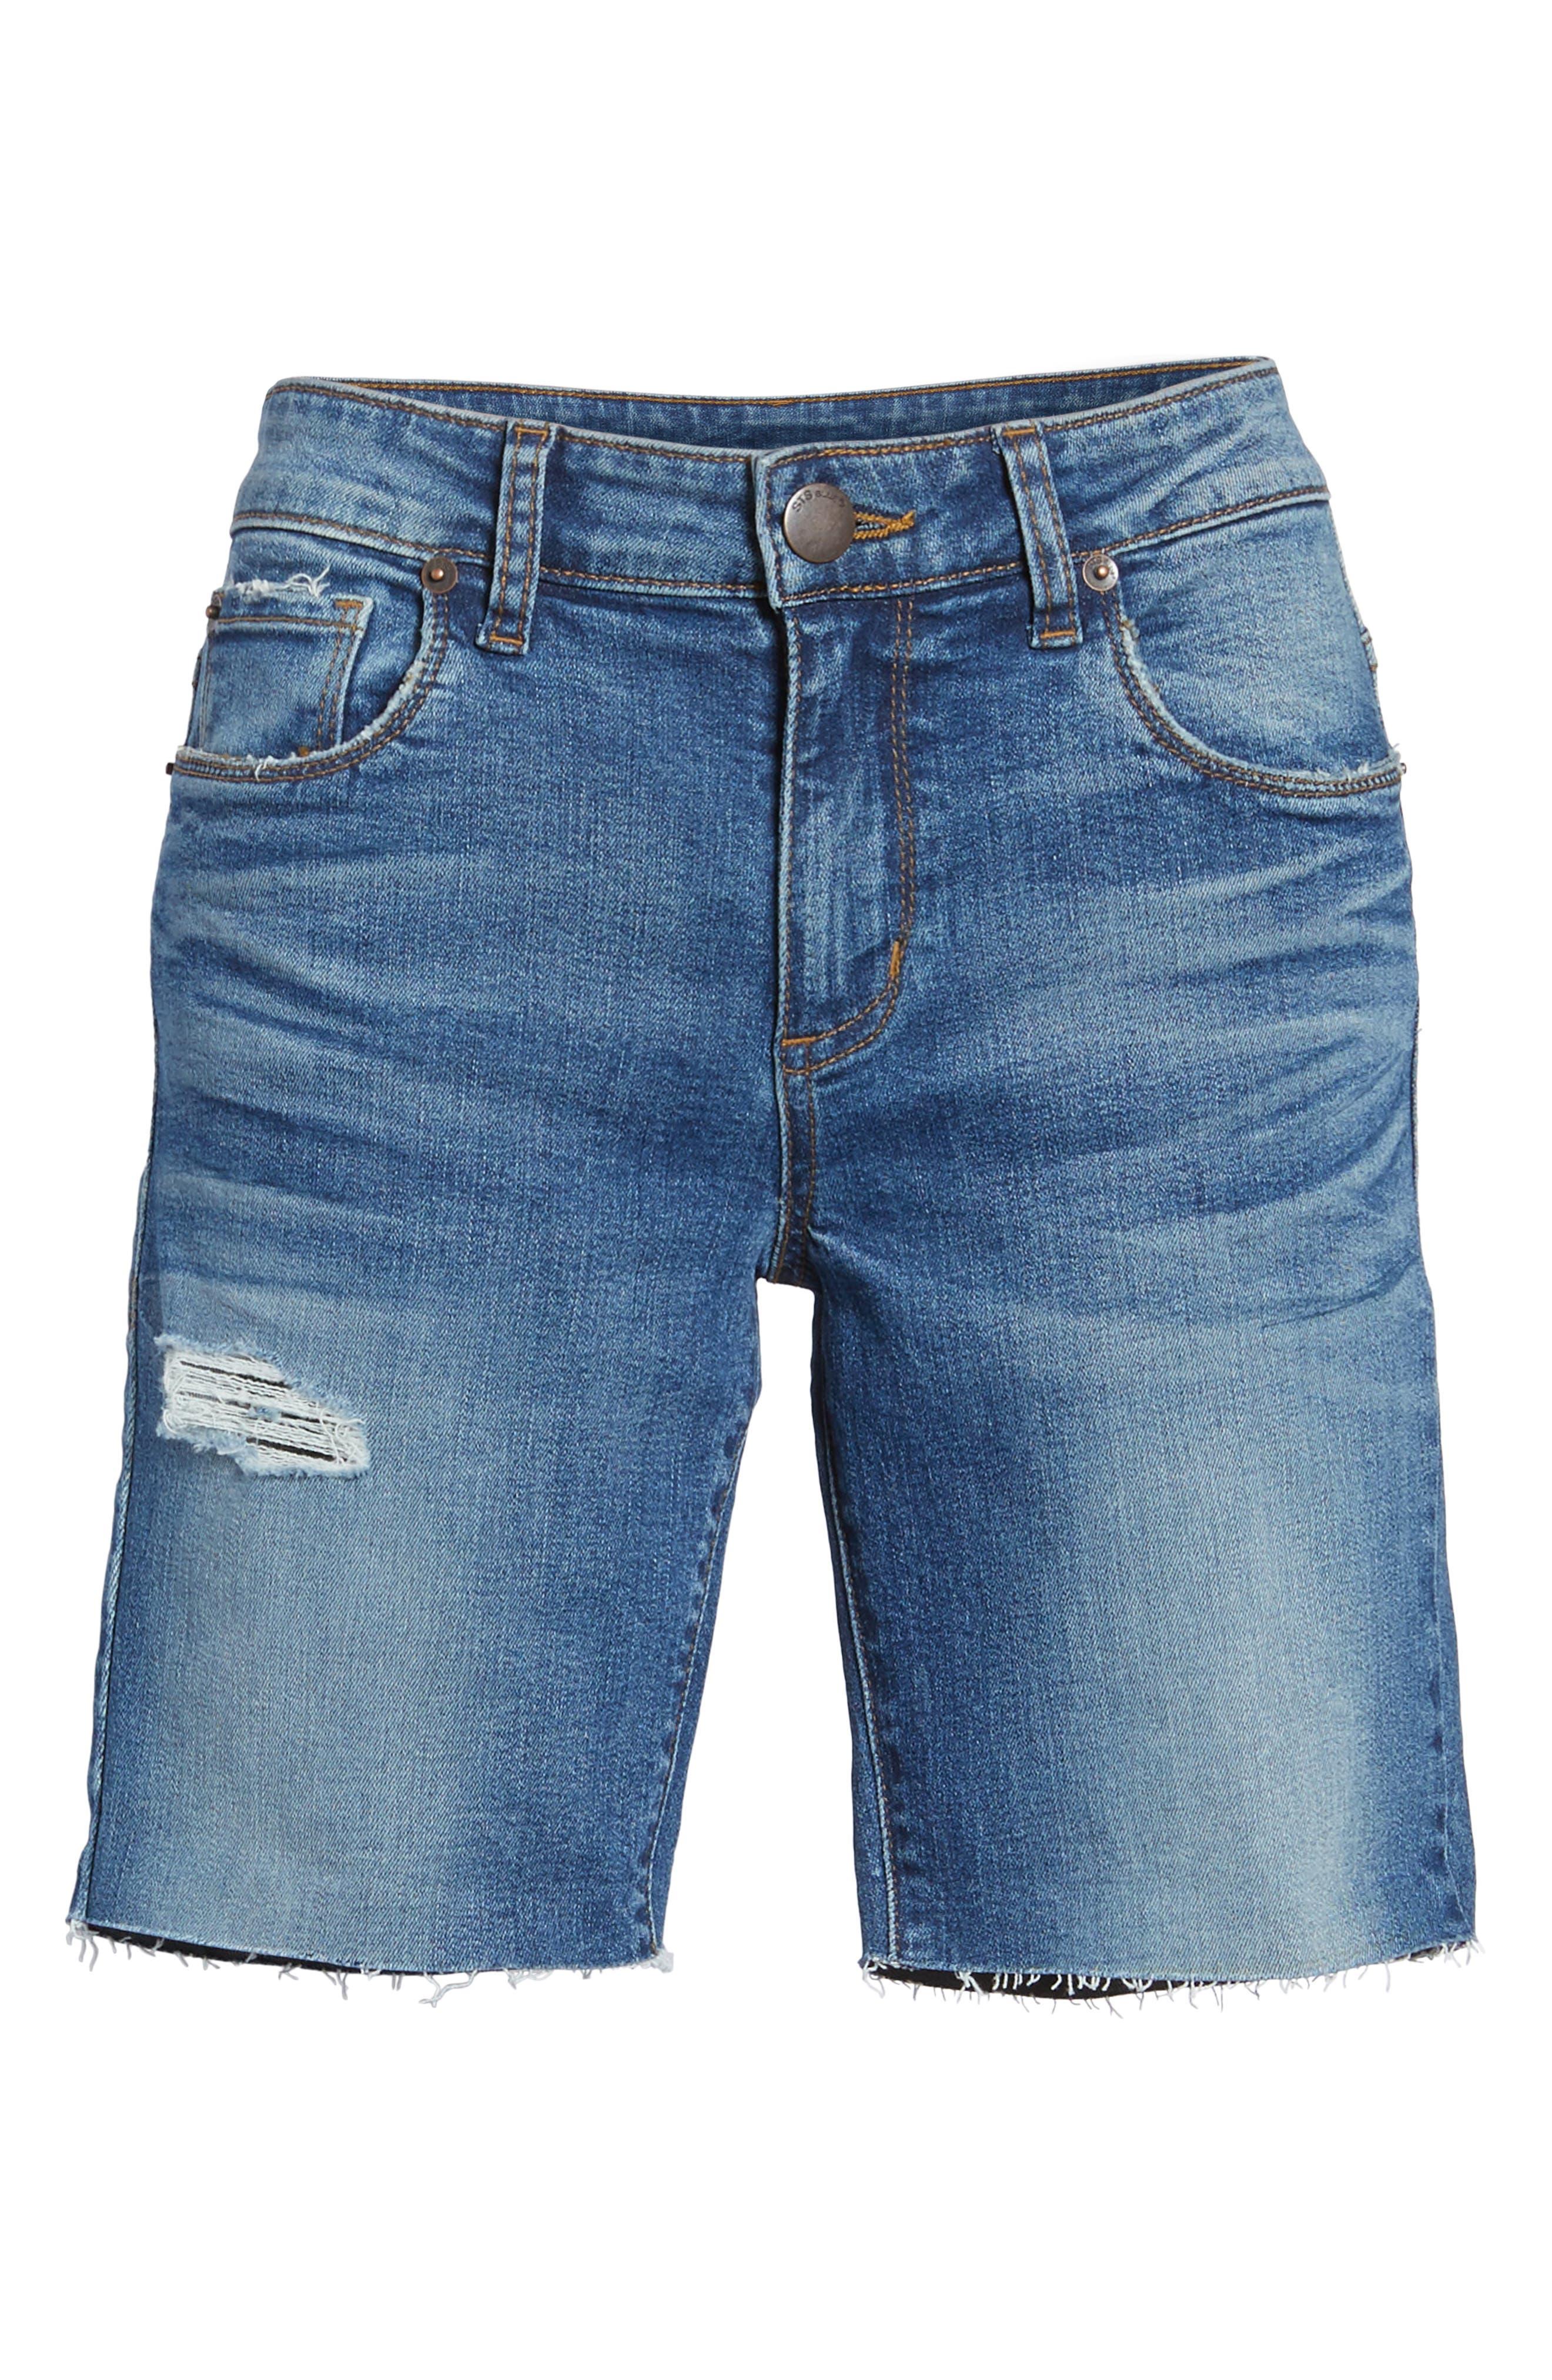 Cuffed Bermuda Denim Shorts,                             Alternate thumbnail 6, color,                             406